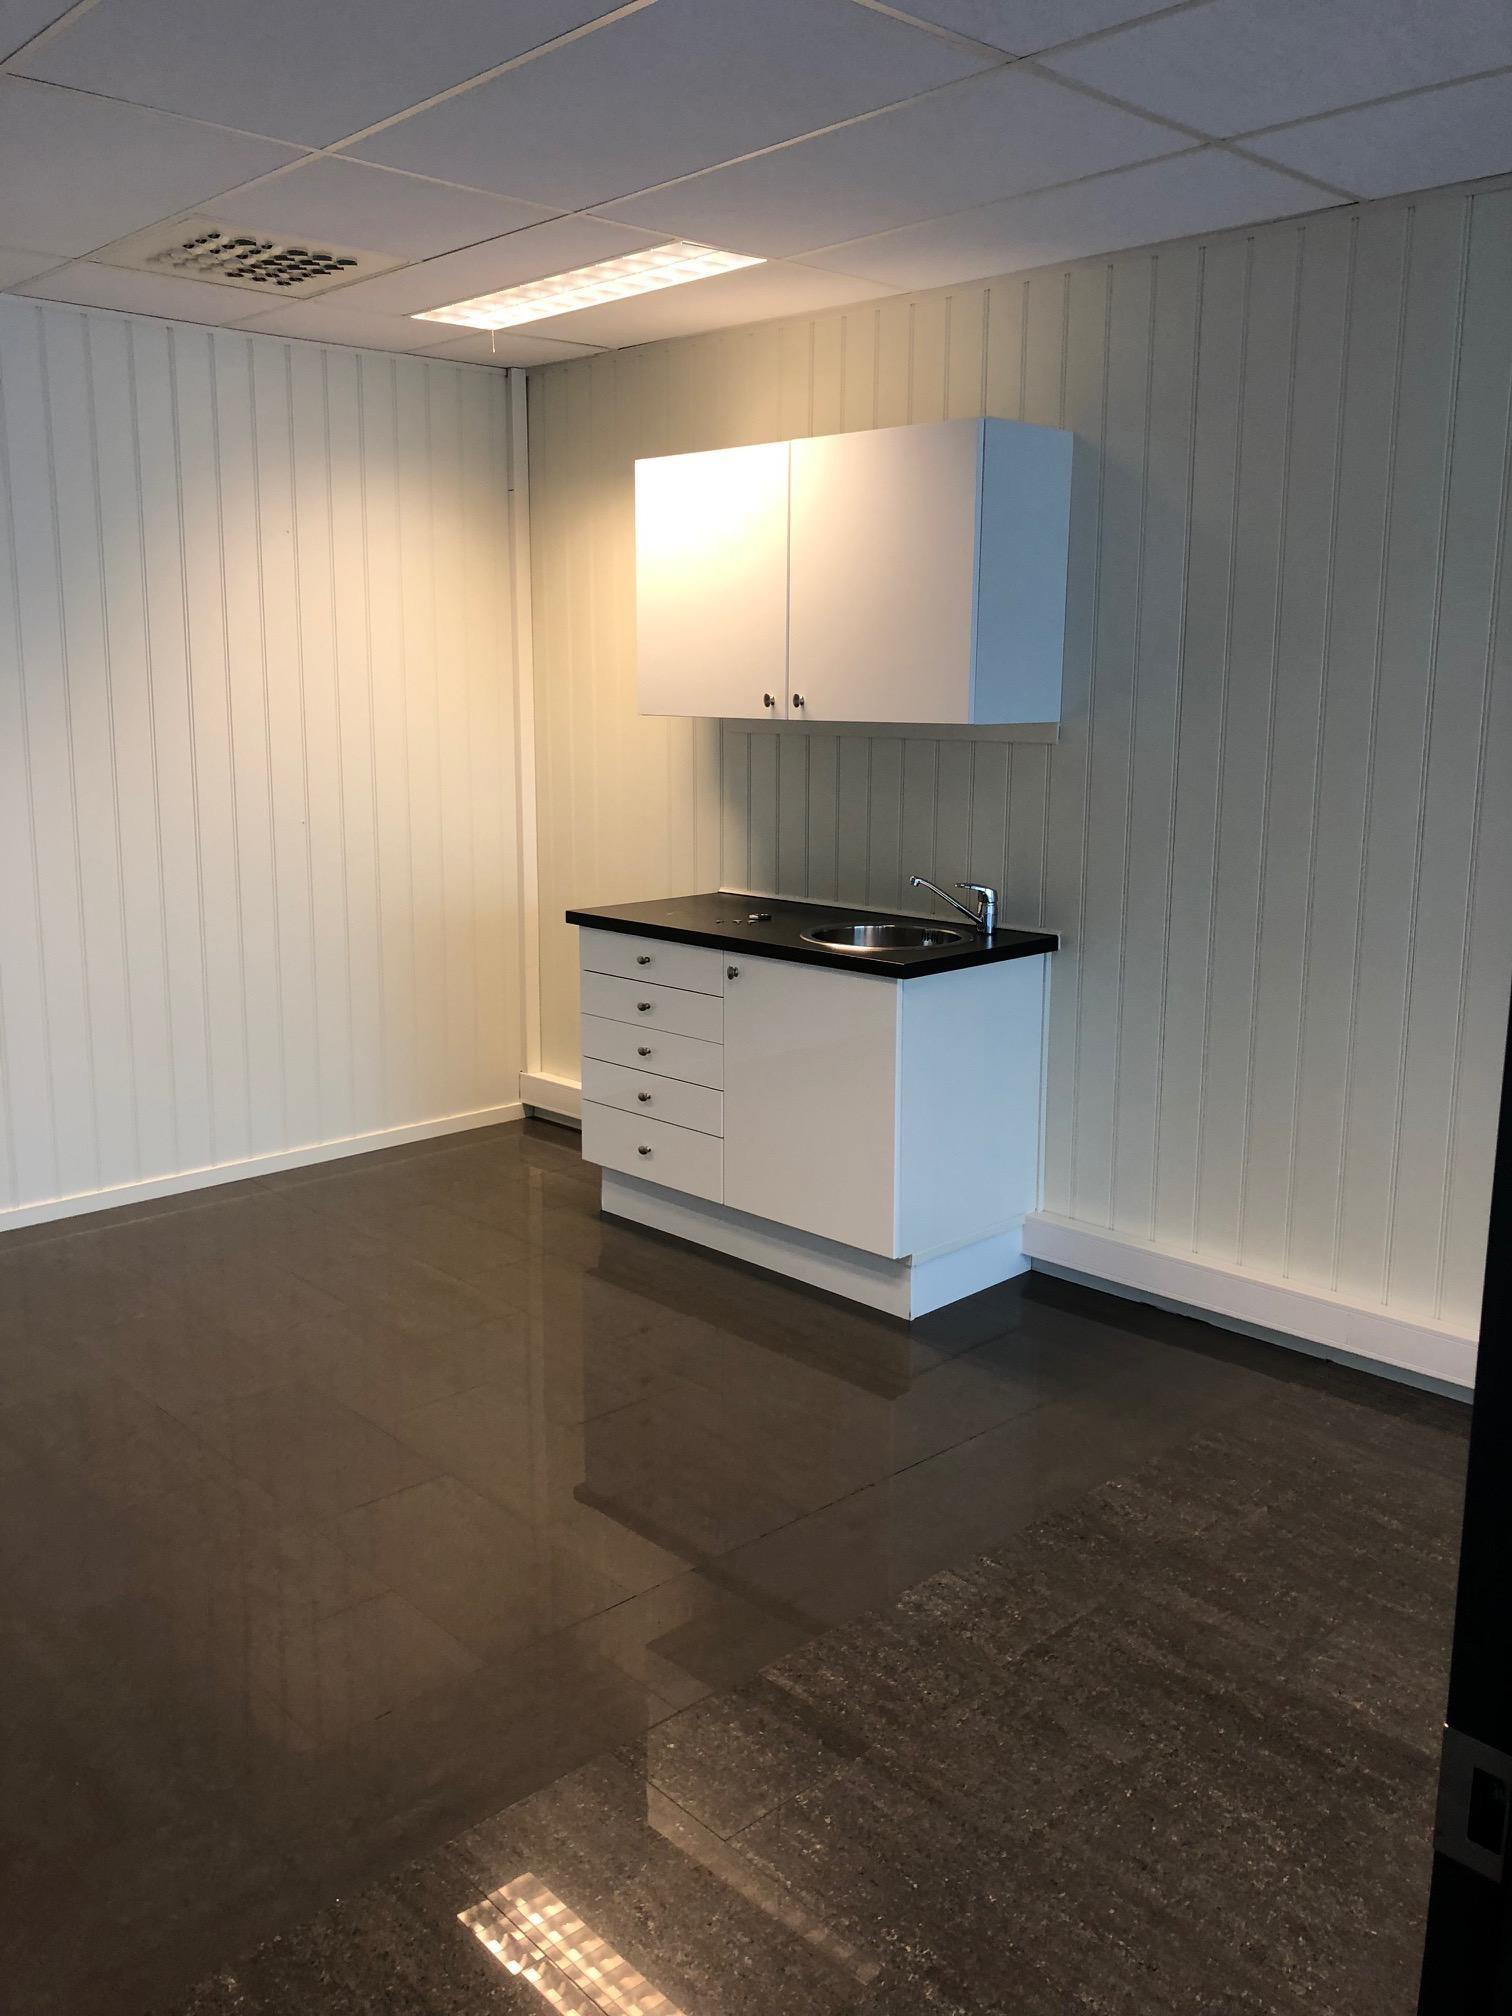 Te-kjøkken - 2. etasje lokale ca 135 kvm